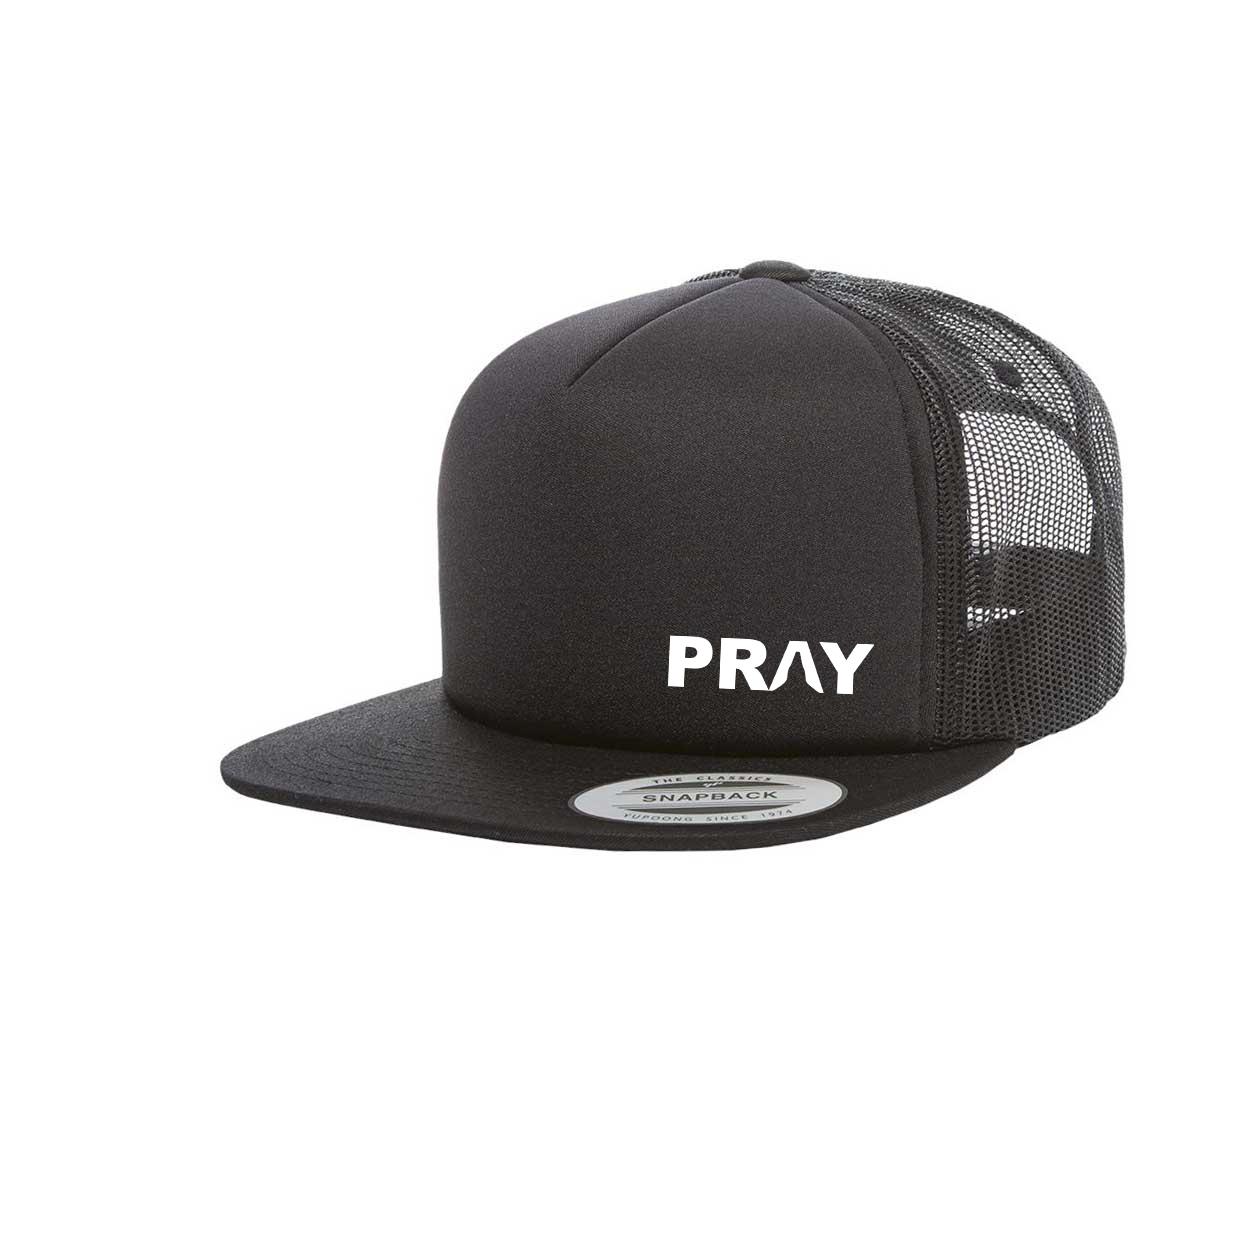 Pray Hands Logo Night Out Premium Foam Flat Brim Snapback Hat Black (White Logo)